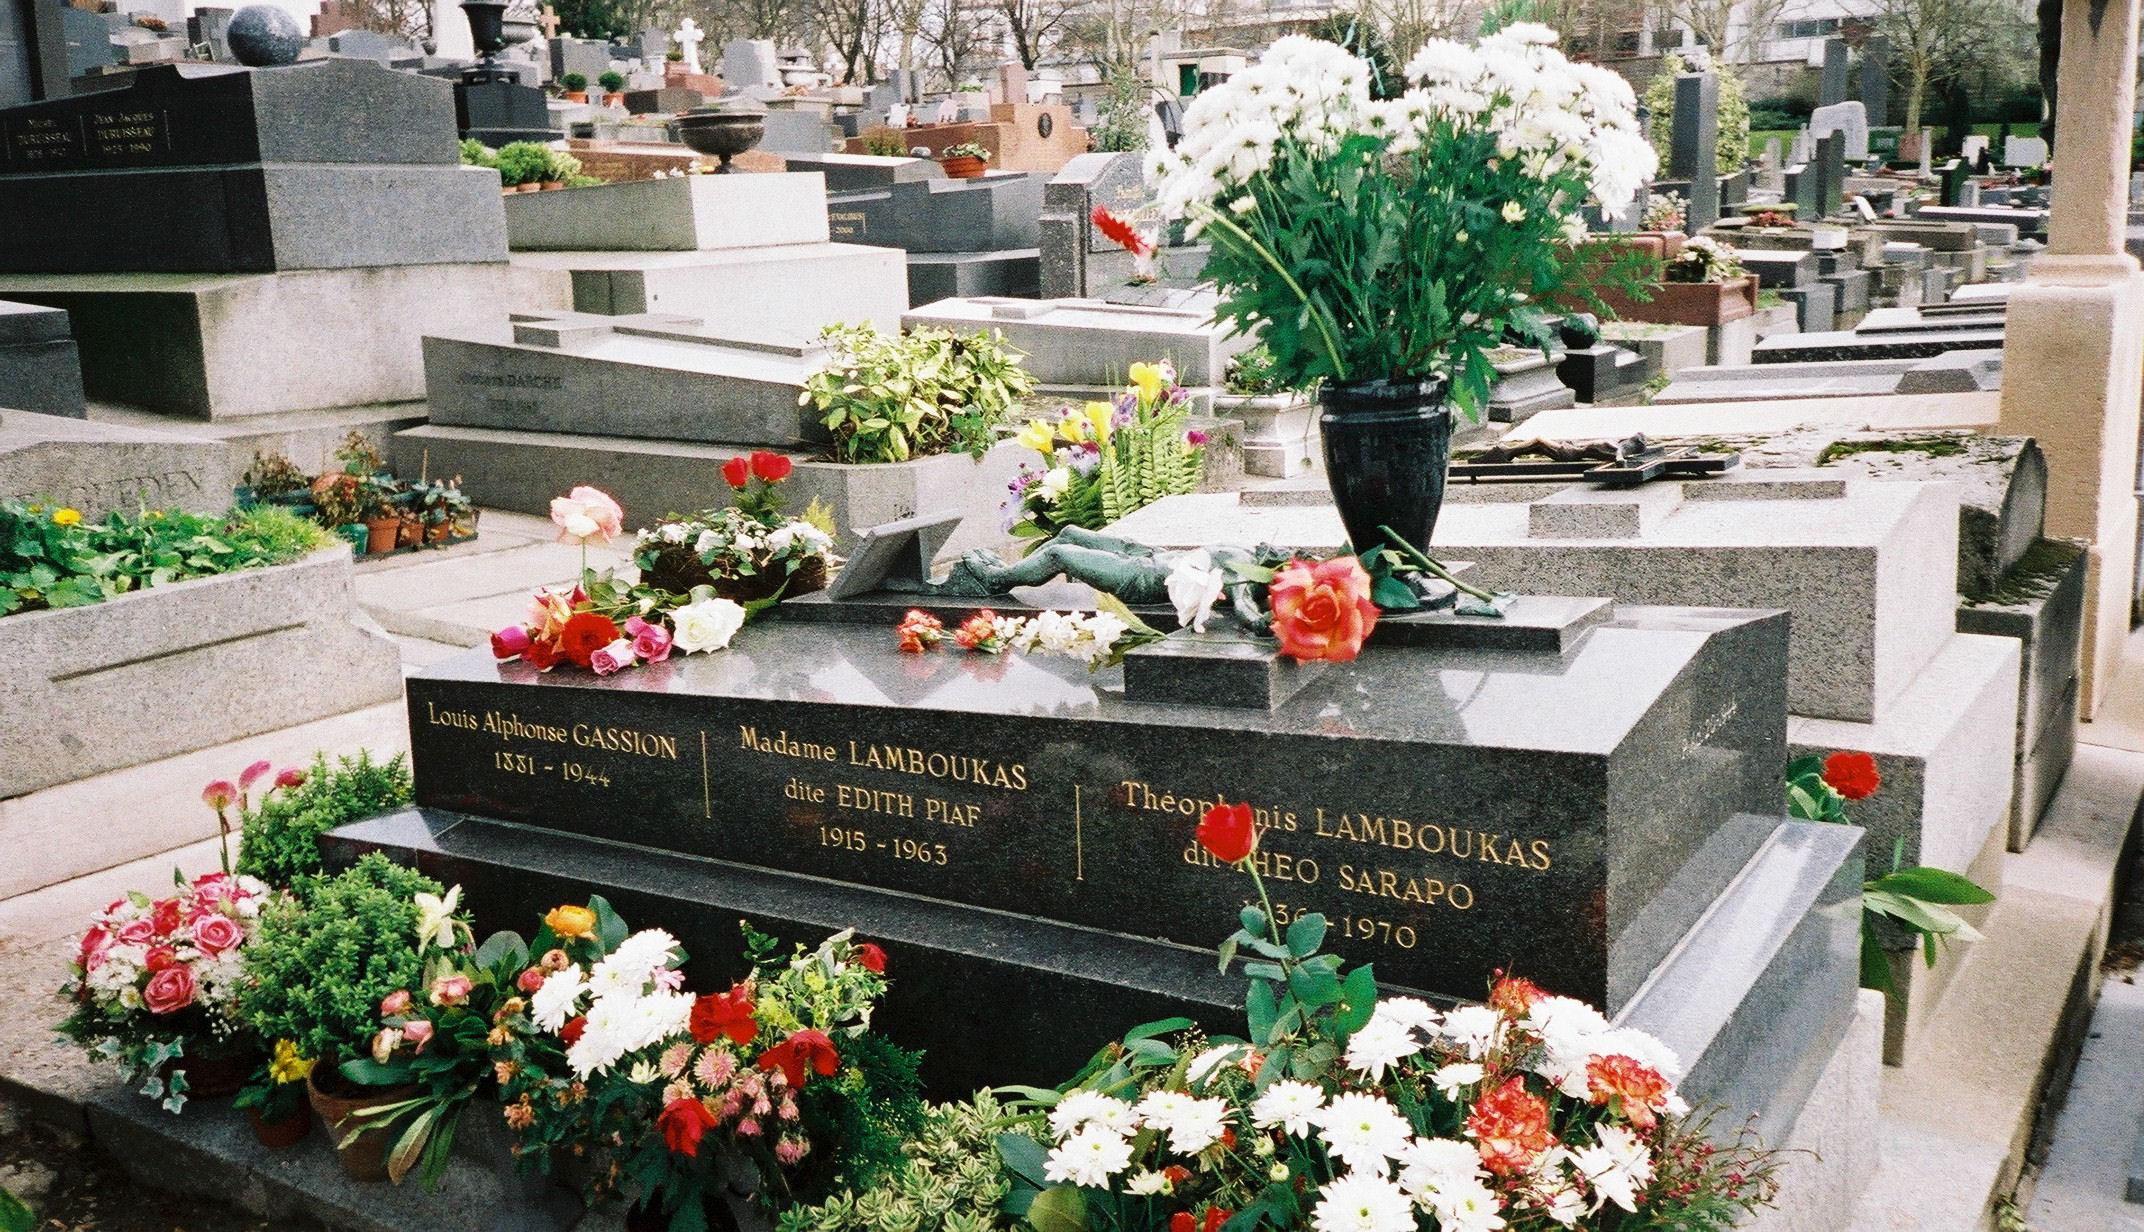 Princess Diana Gravesite File Edith Piafs Grave P 232 Re Lachaise Cemetery Paris